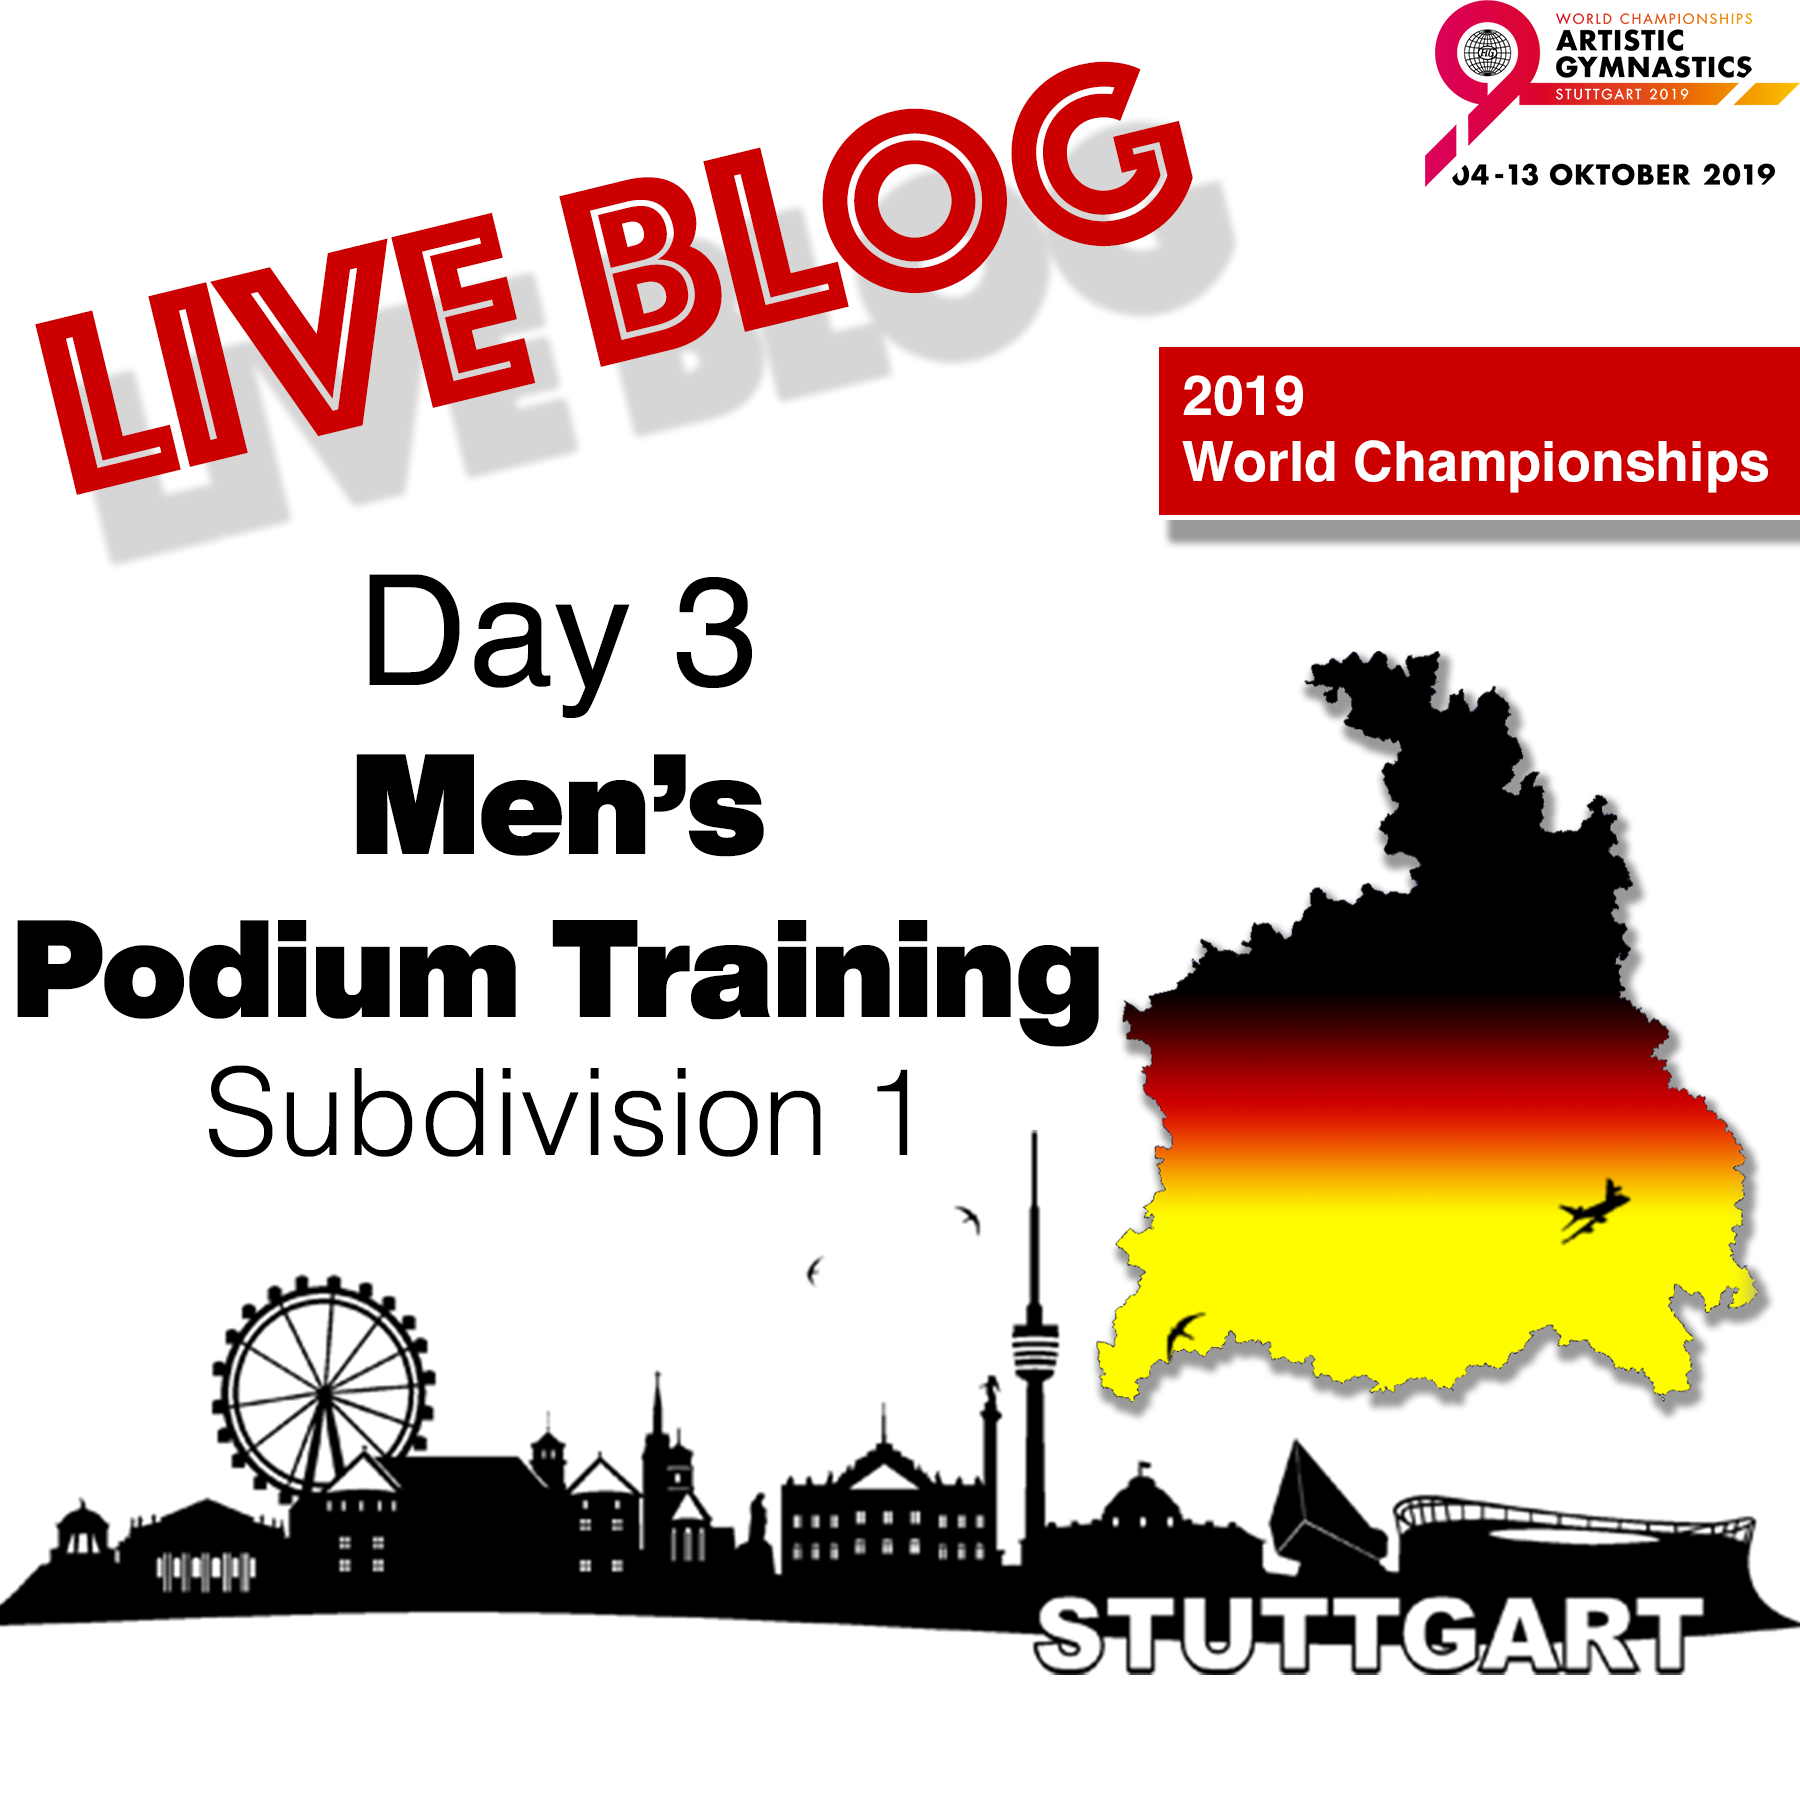 Live Blog: 2019 World Championships – MAG Podium Training – Sub Division 1, Oct. 2nd